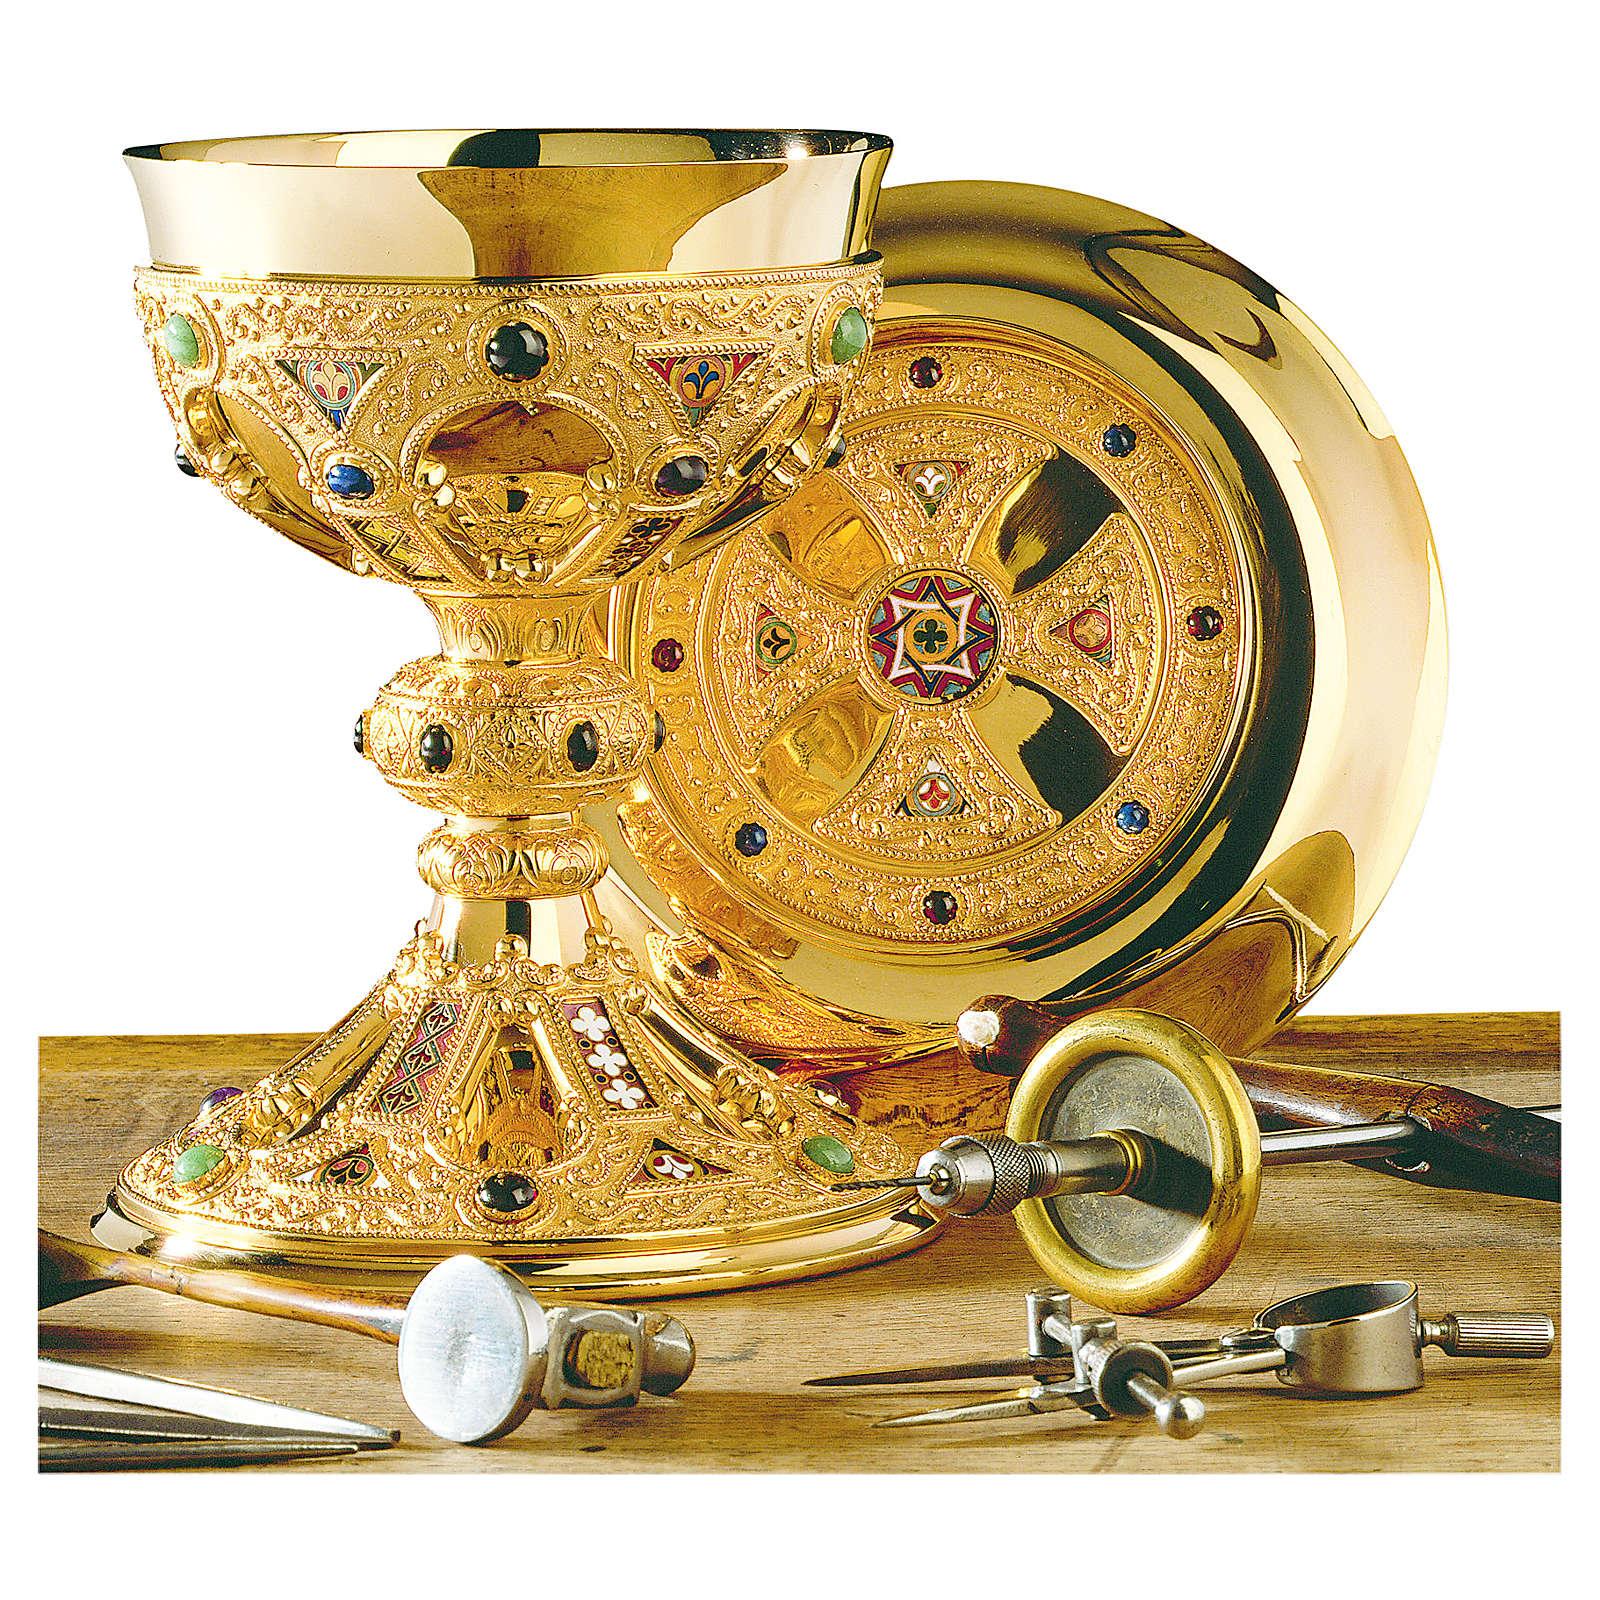 Cálice e patena Molina St. Remy copa em prata 925 maciça 4